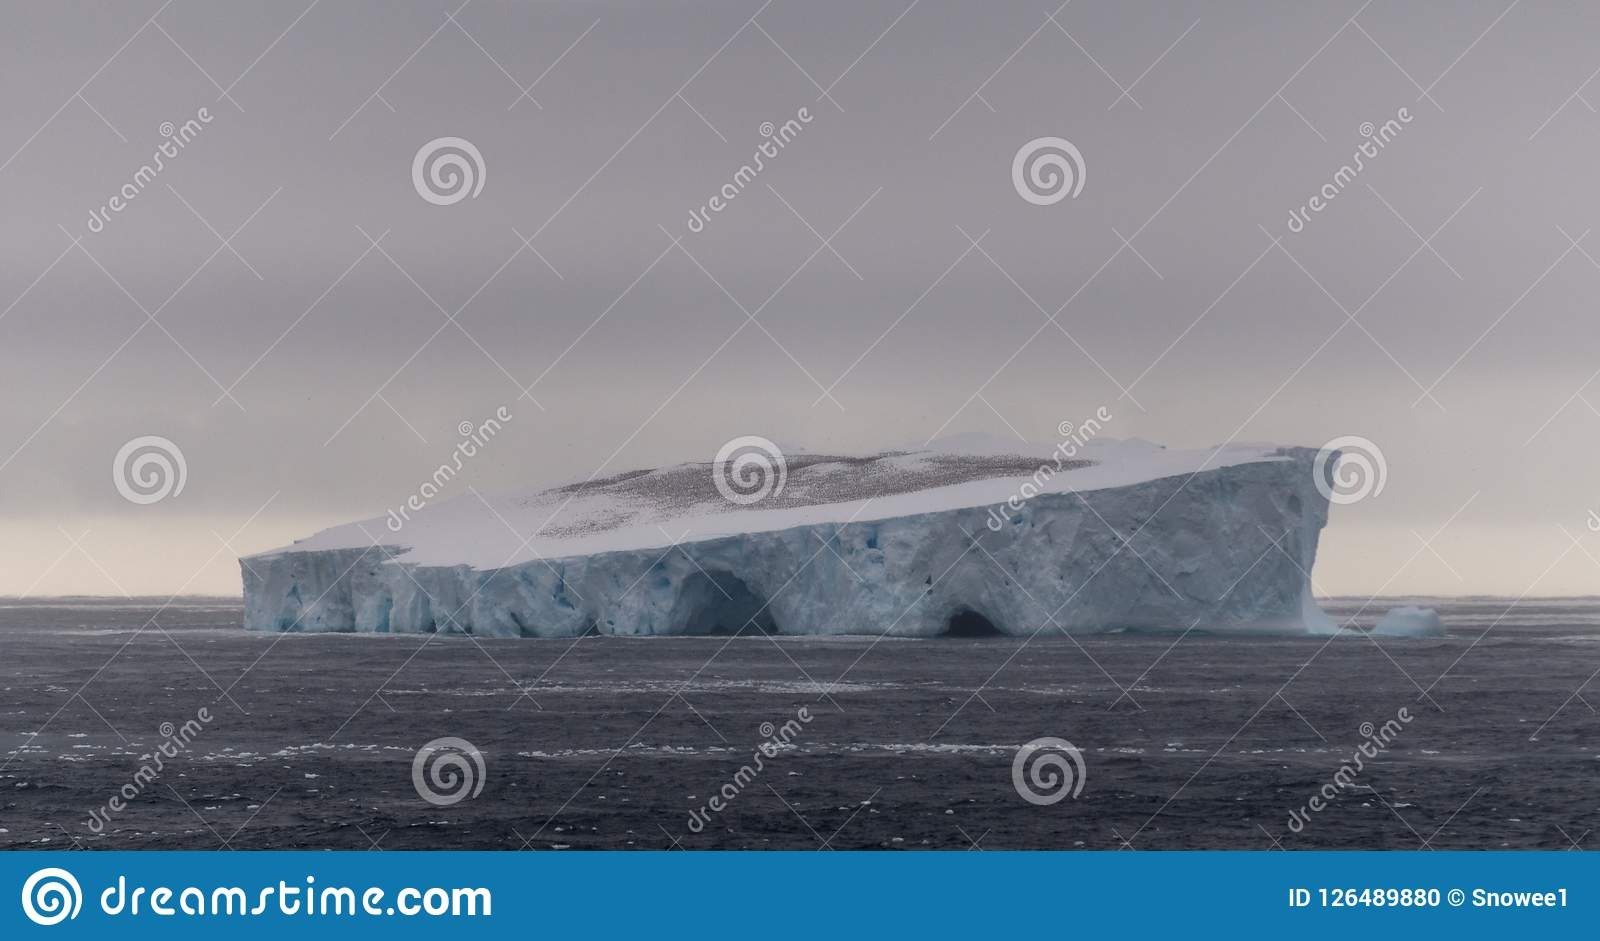 Огромное стадо антартических буревестников na górze таблитчатого айсберга, южного океана, Антарктики